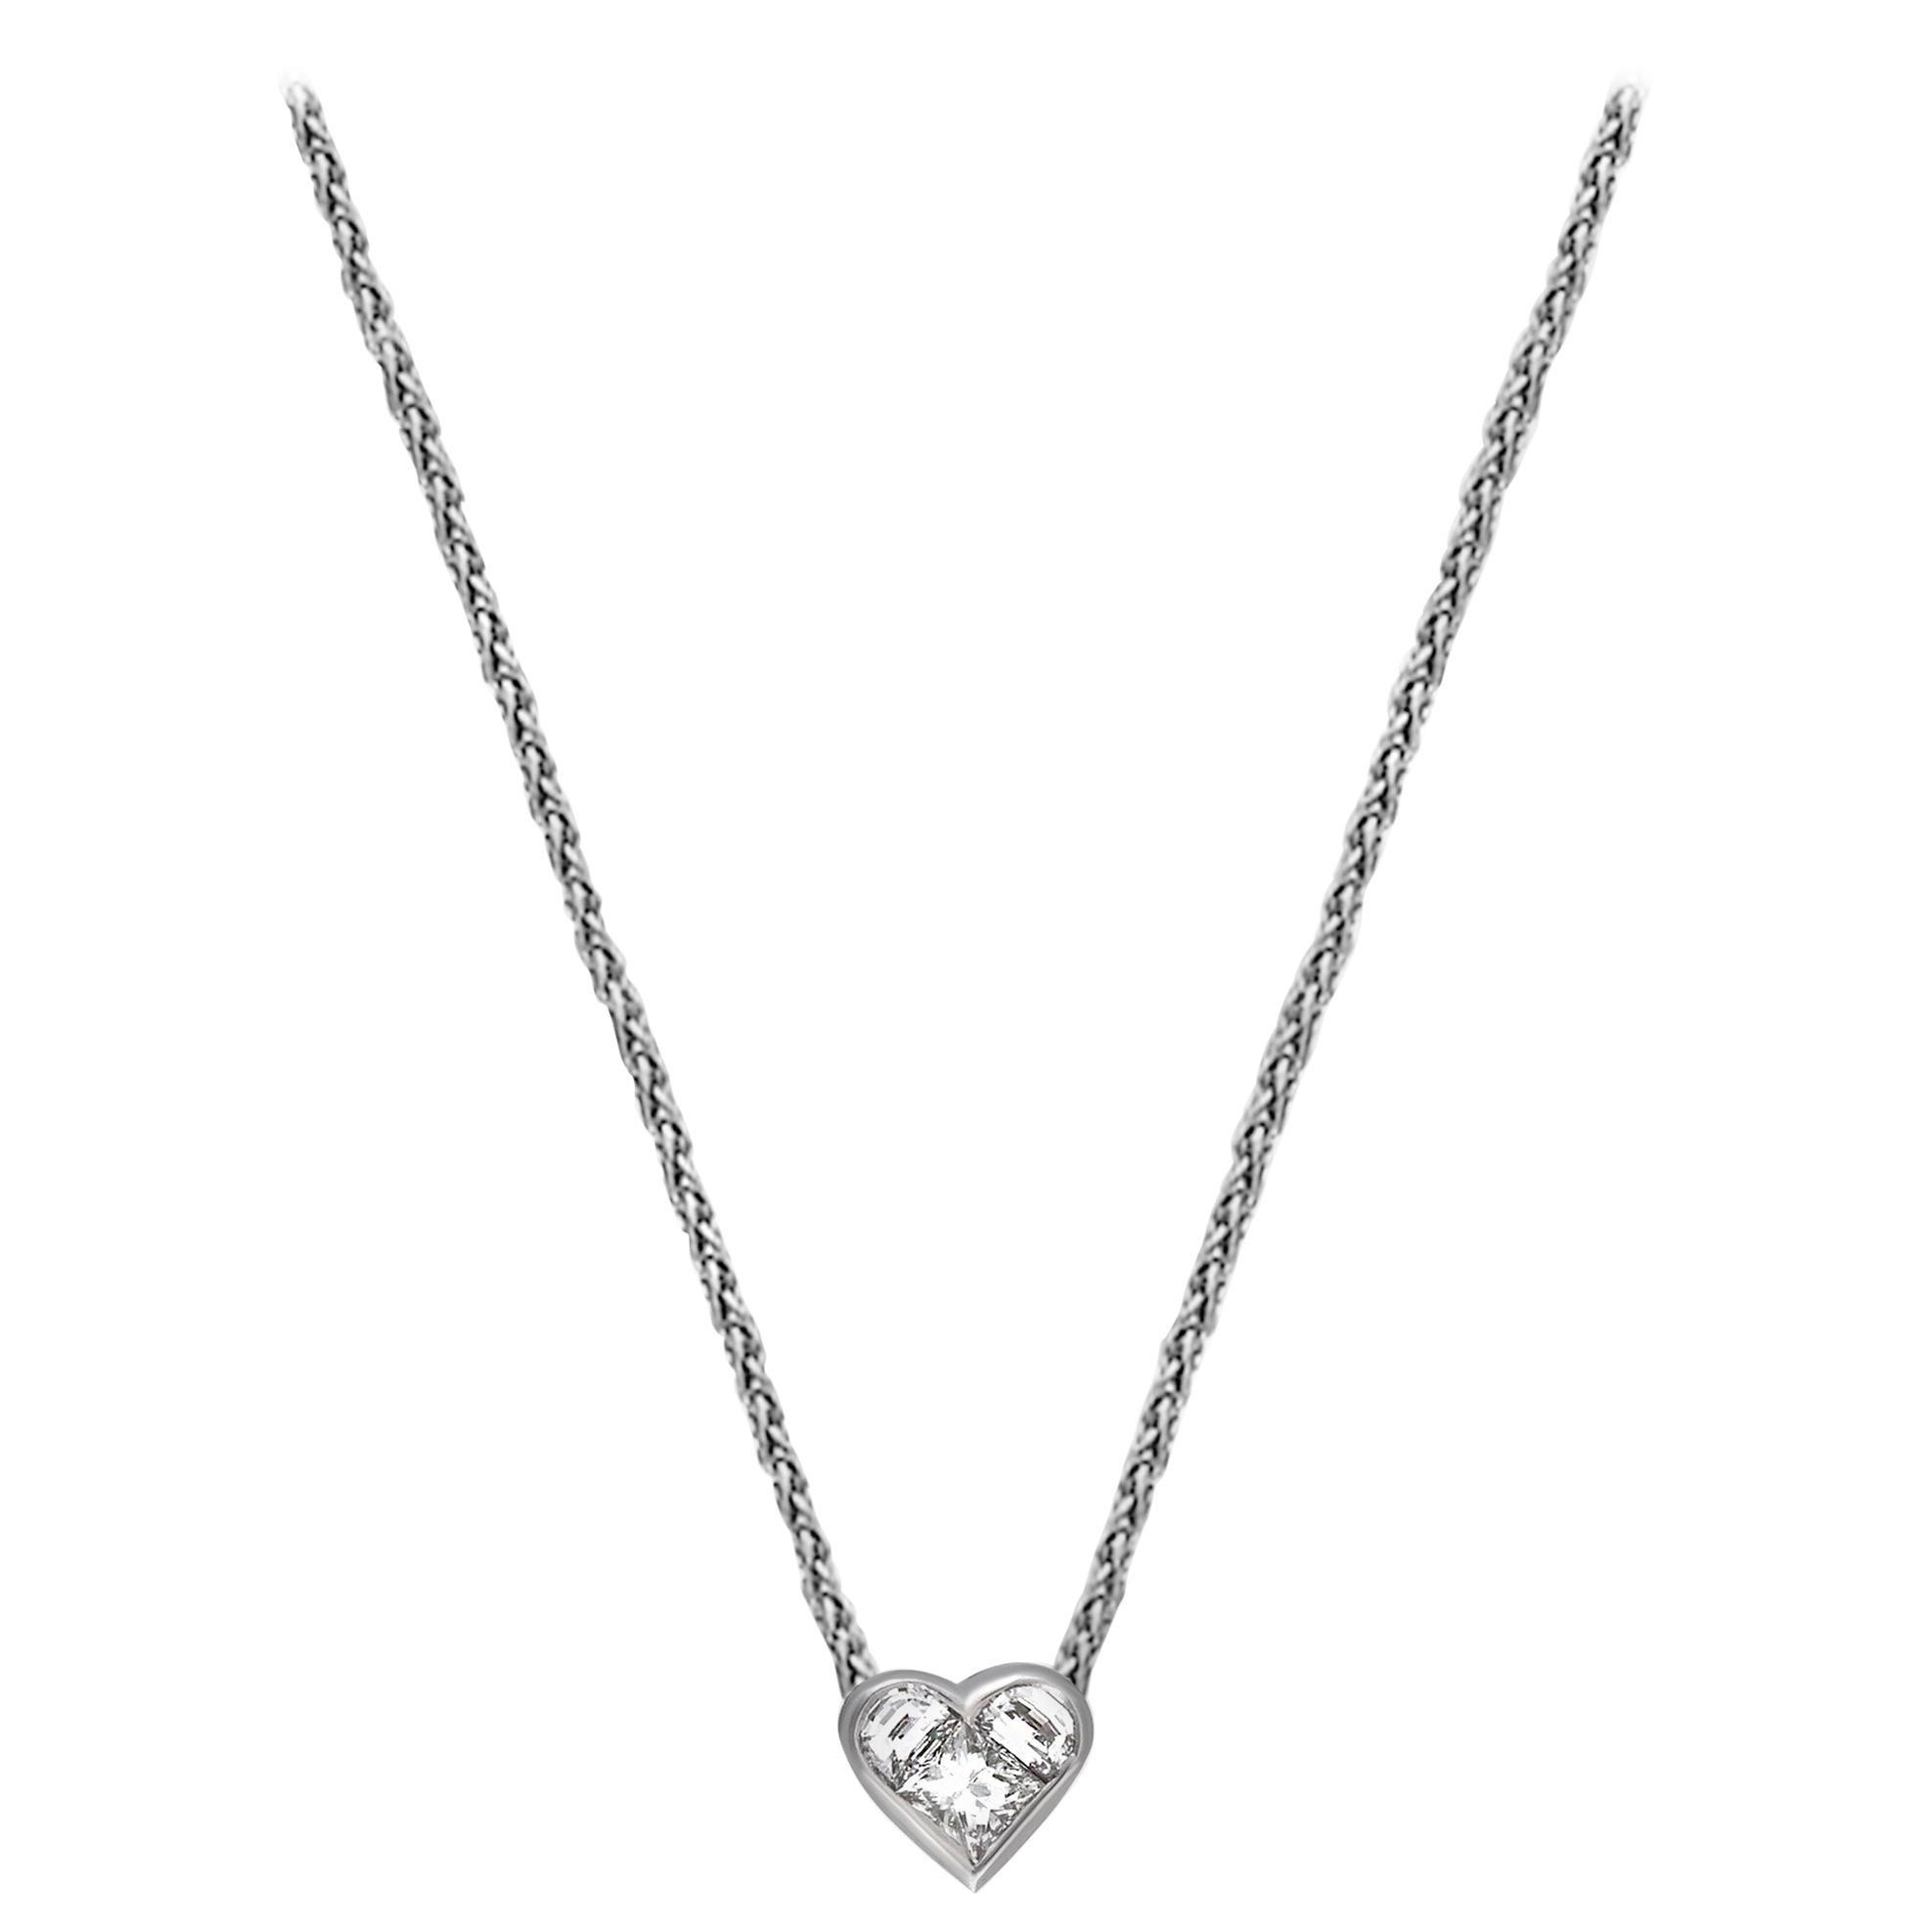 Bvlgari 18 Karat White Gold Diamond Heart Necklace